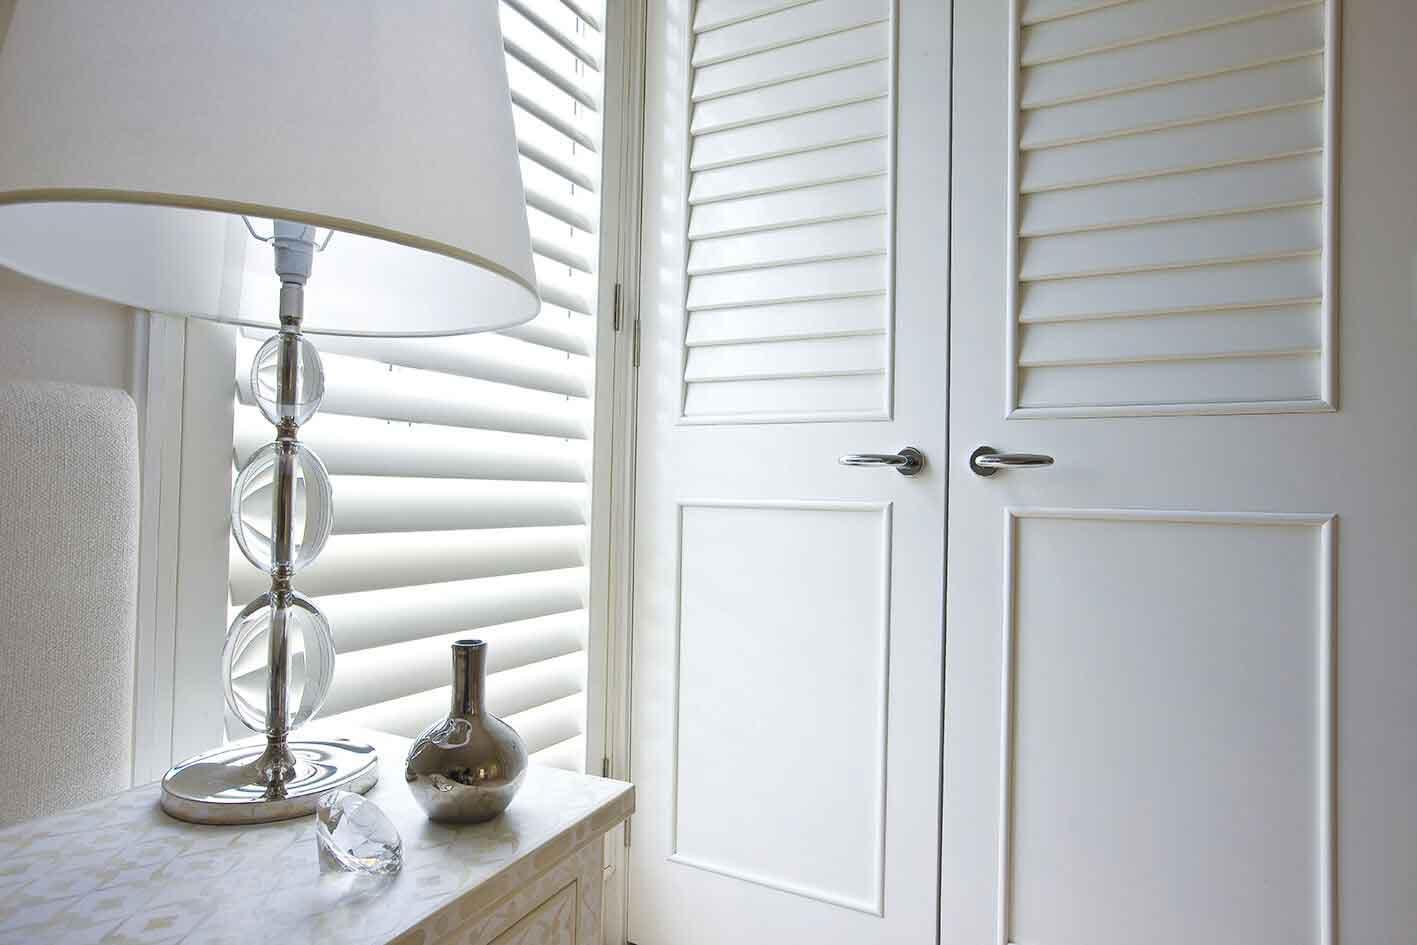 A white wooden closet